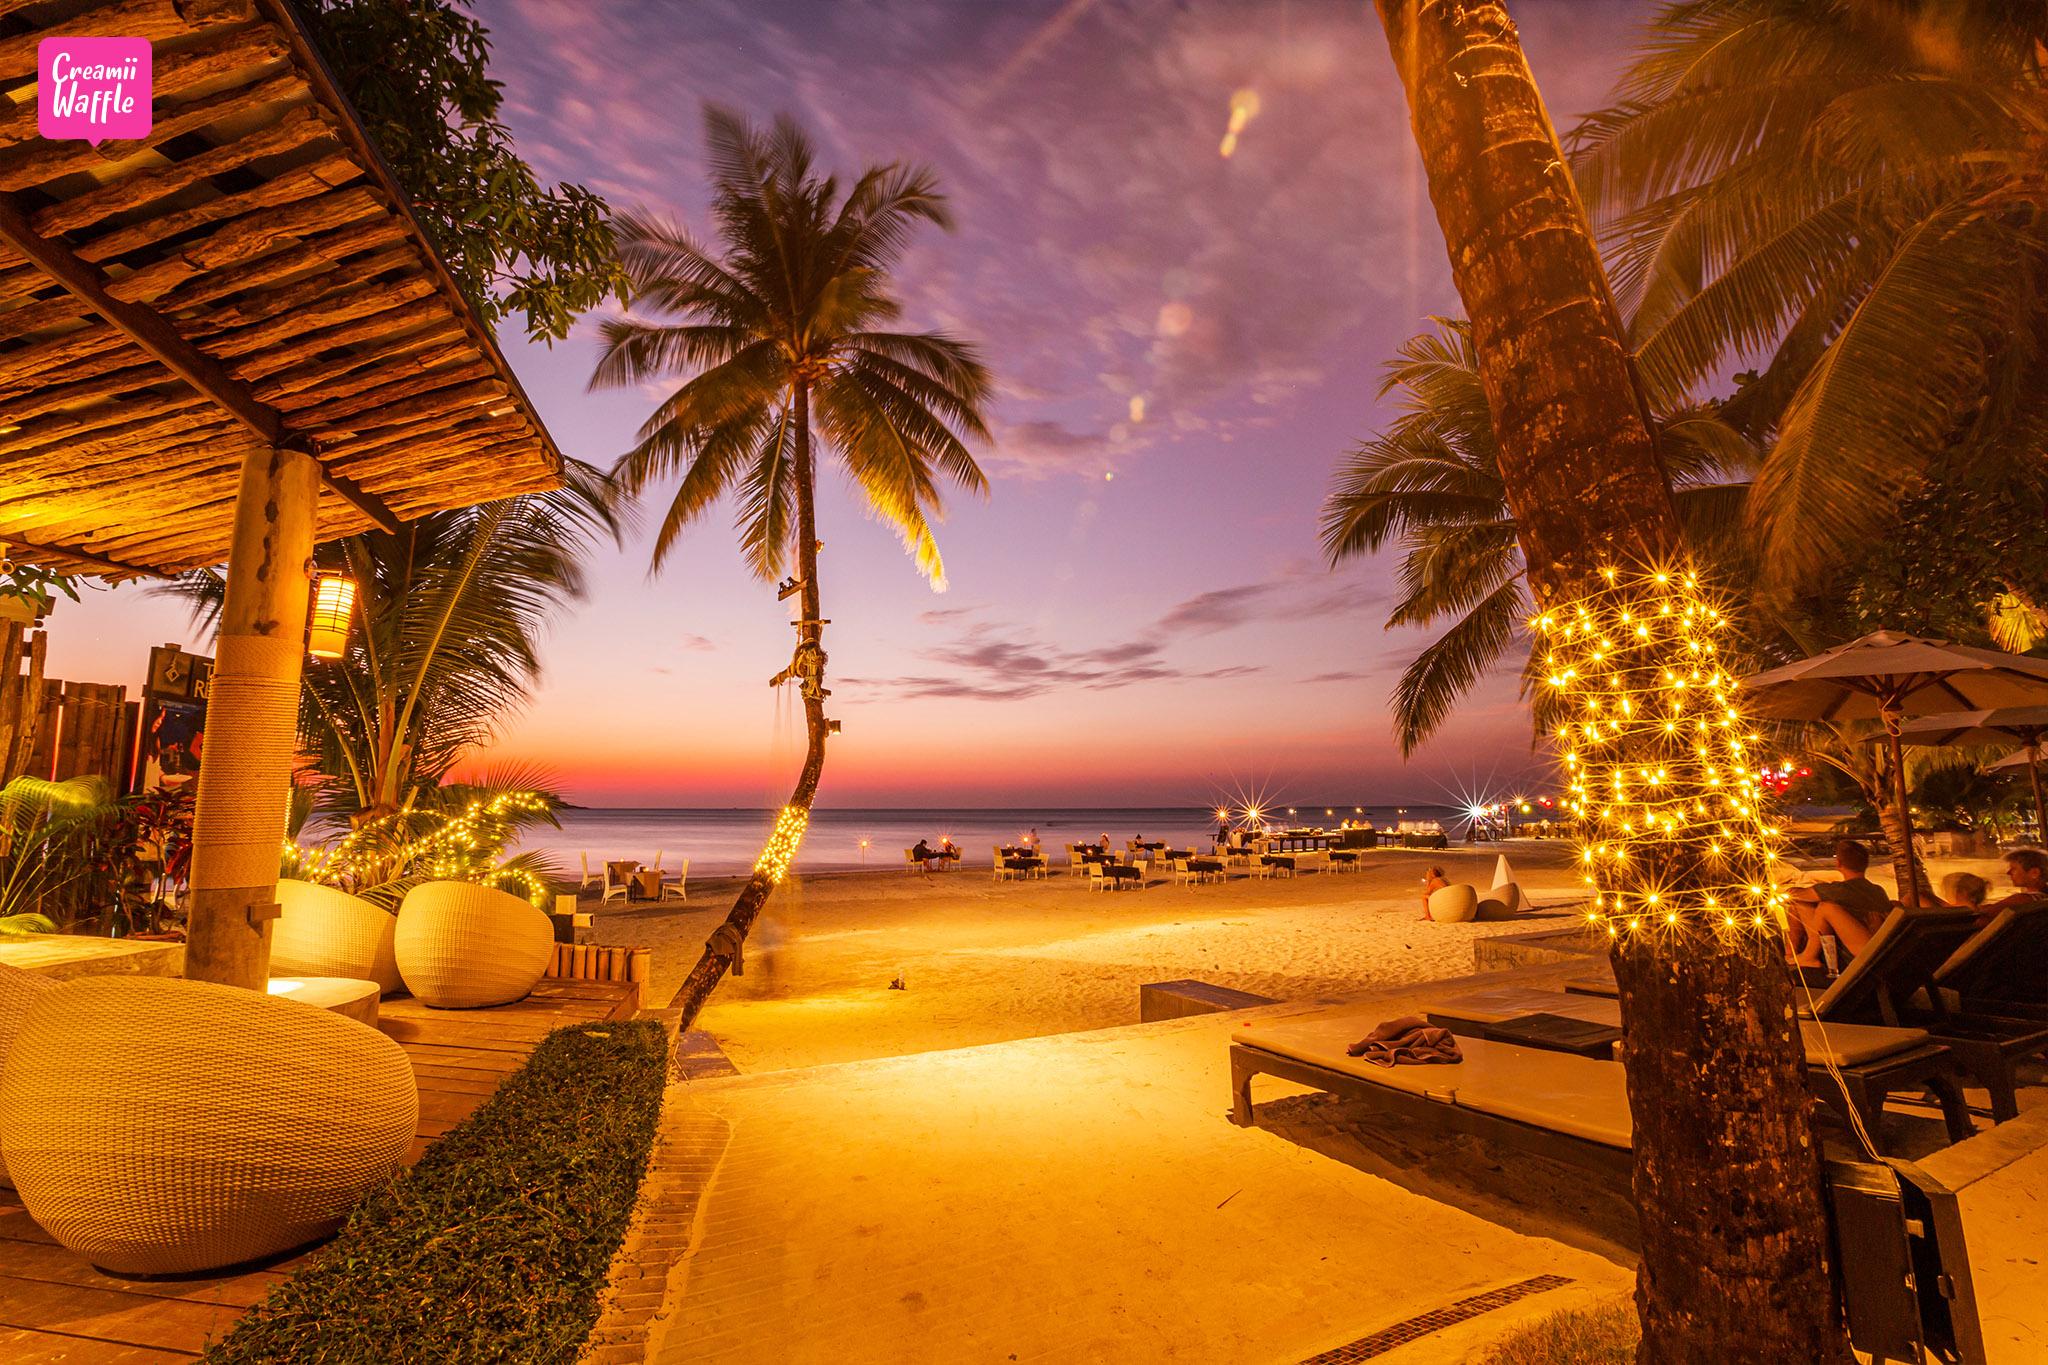 The Dewa Koh Chang Dinner สุดหรู ชมพระอาทิย์ตกริมชายหาด